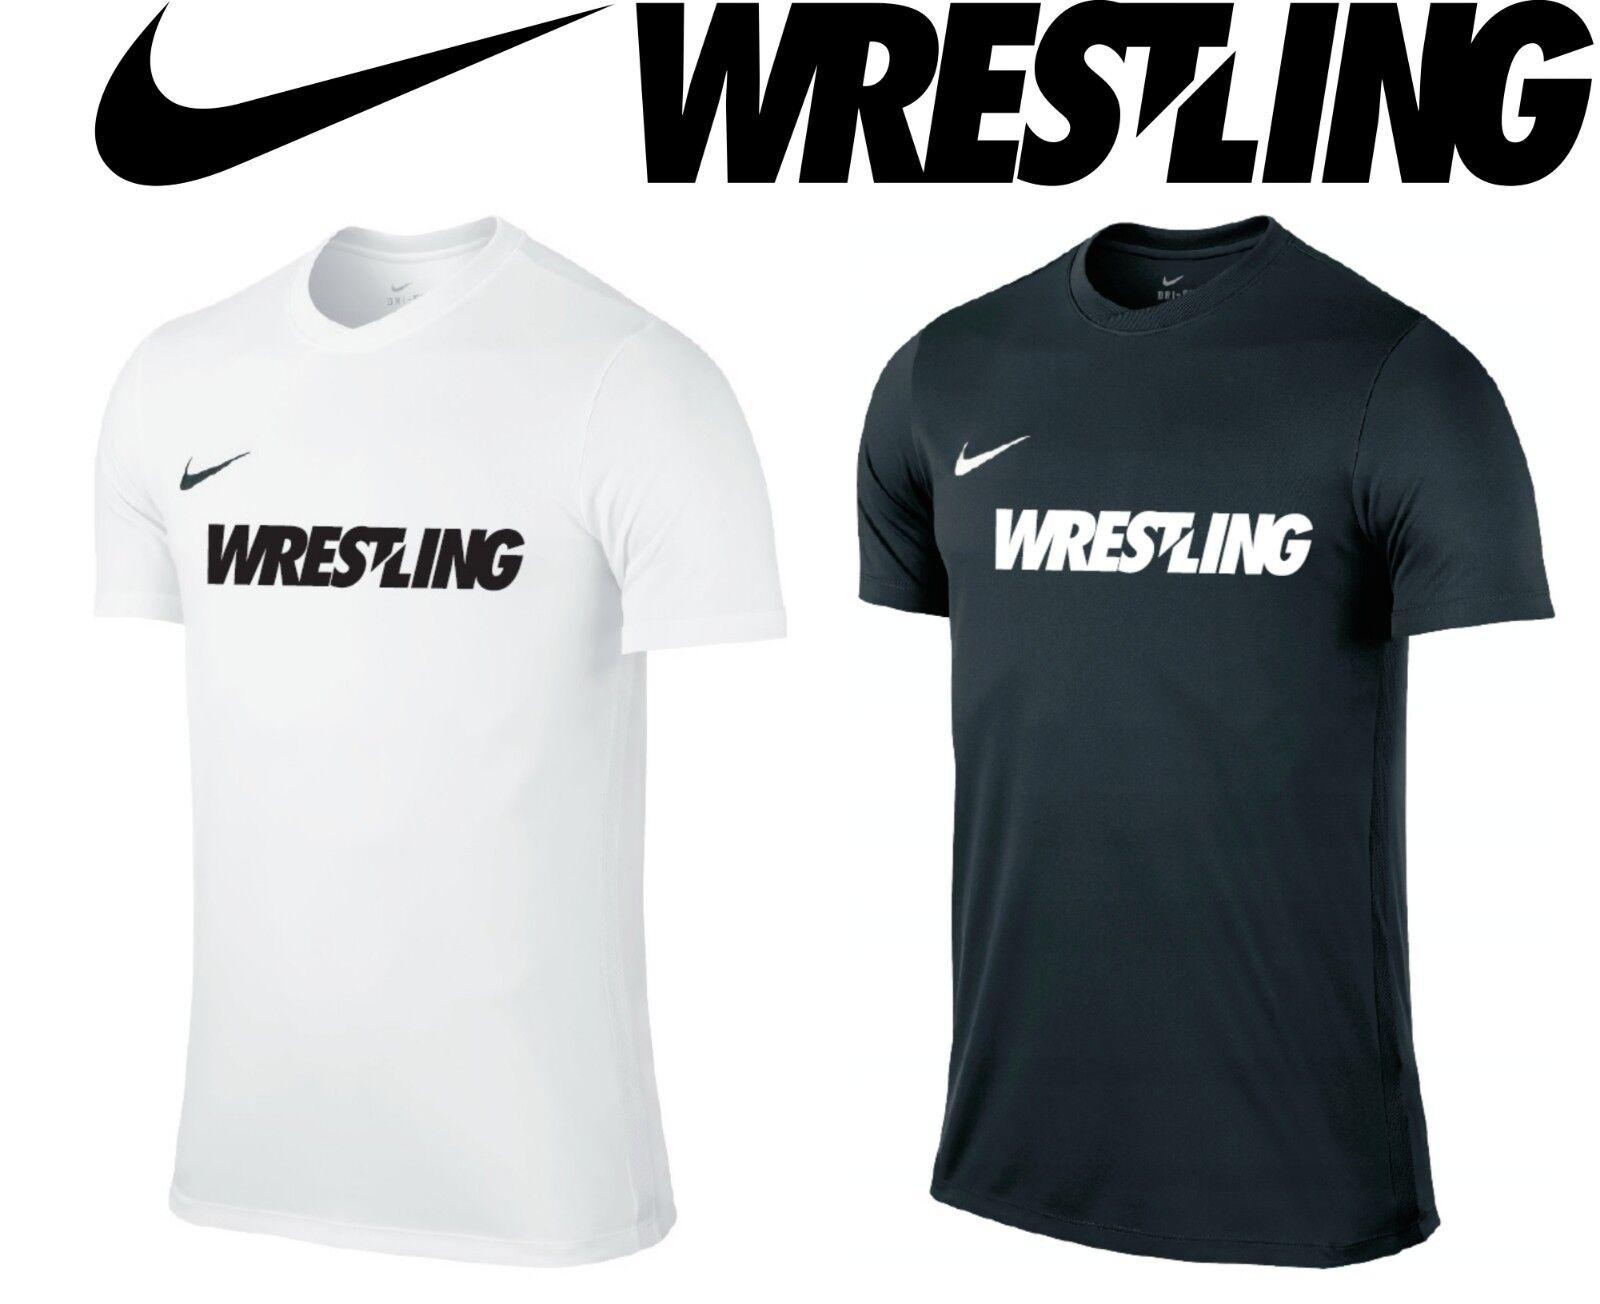 nike weightlifting t shirt für männer